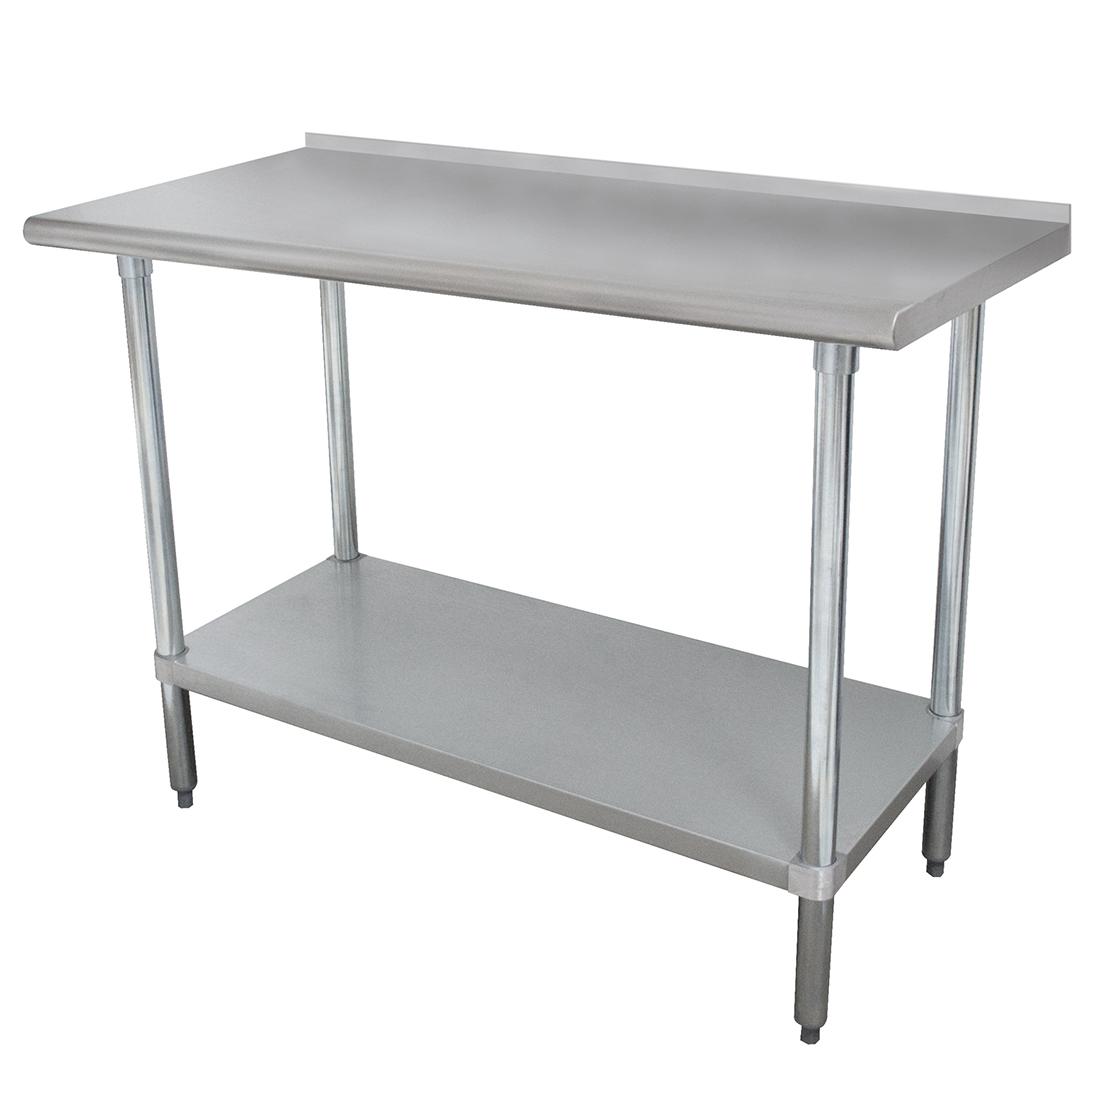 Advance Tabco FMS-3011 work table, 121